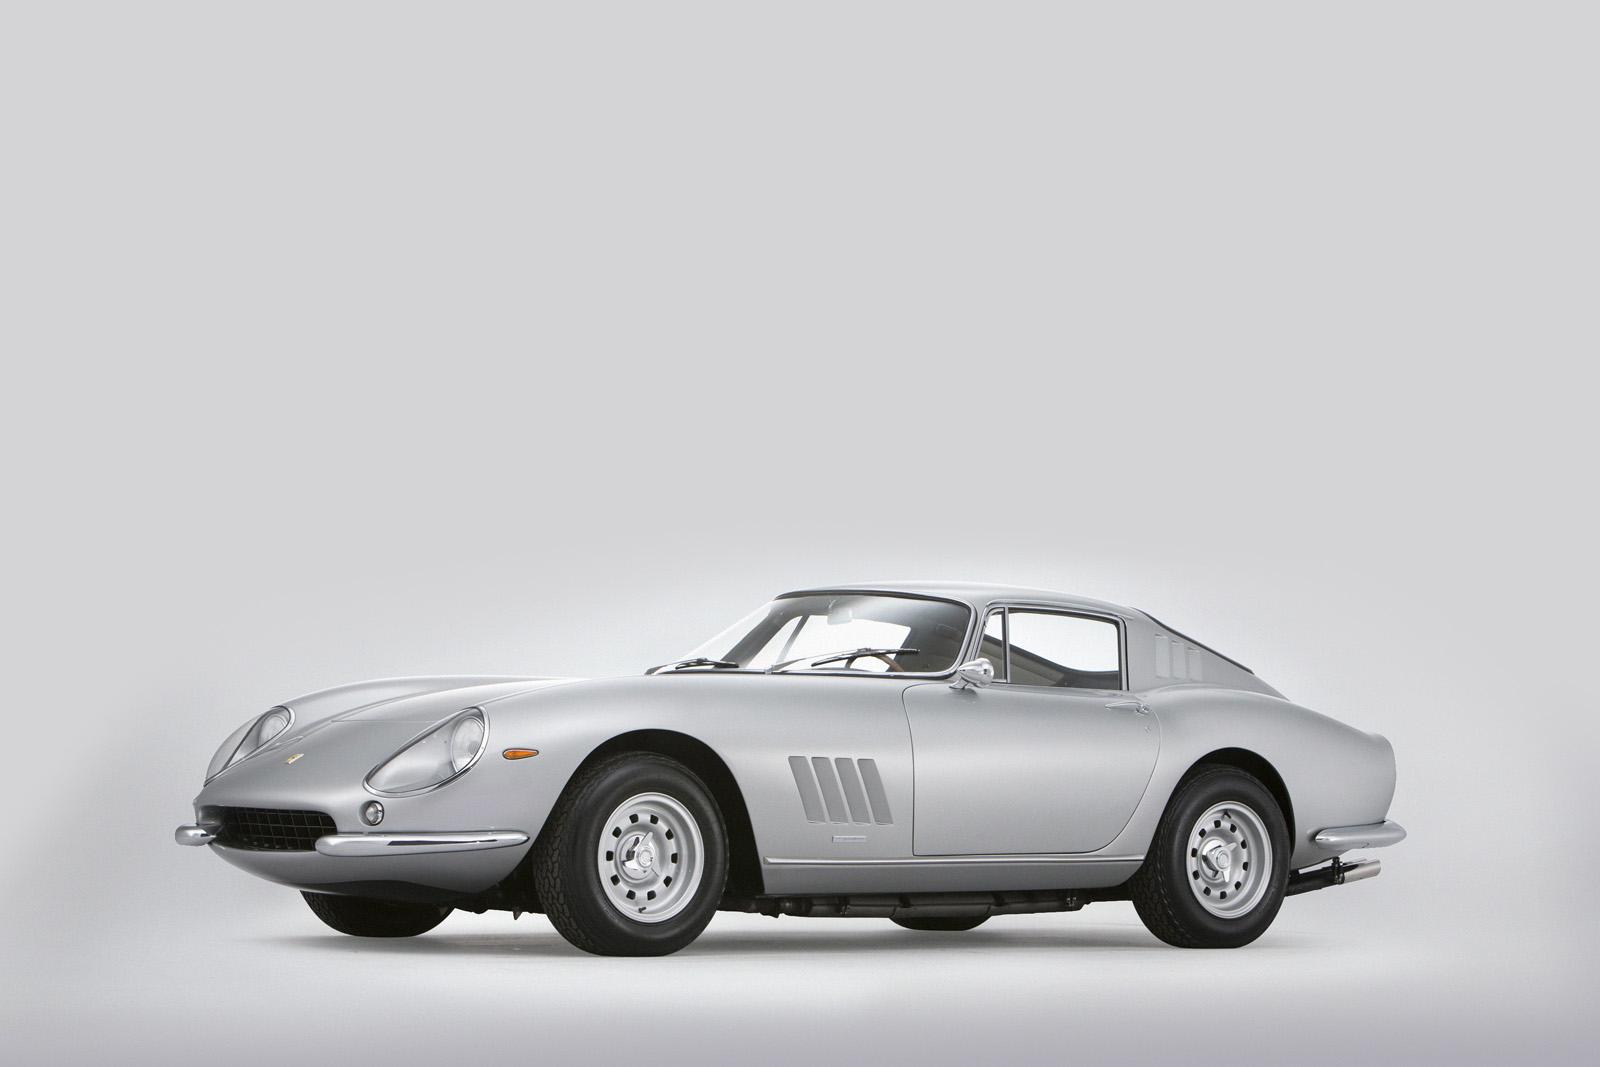 Ferrari275_3quarterfront.jpg